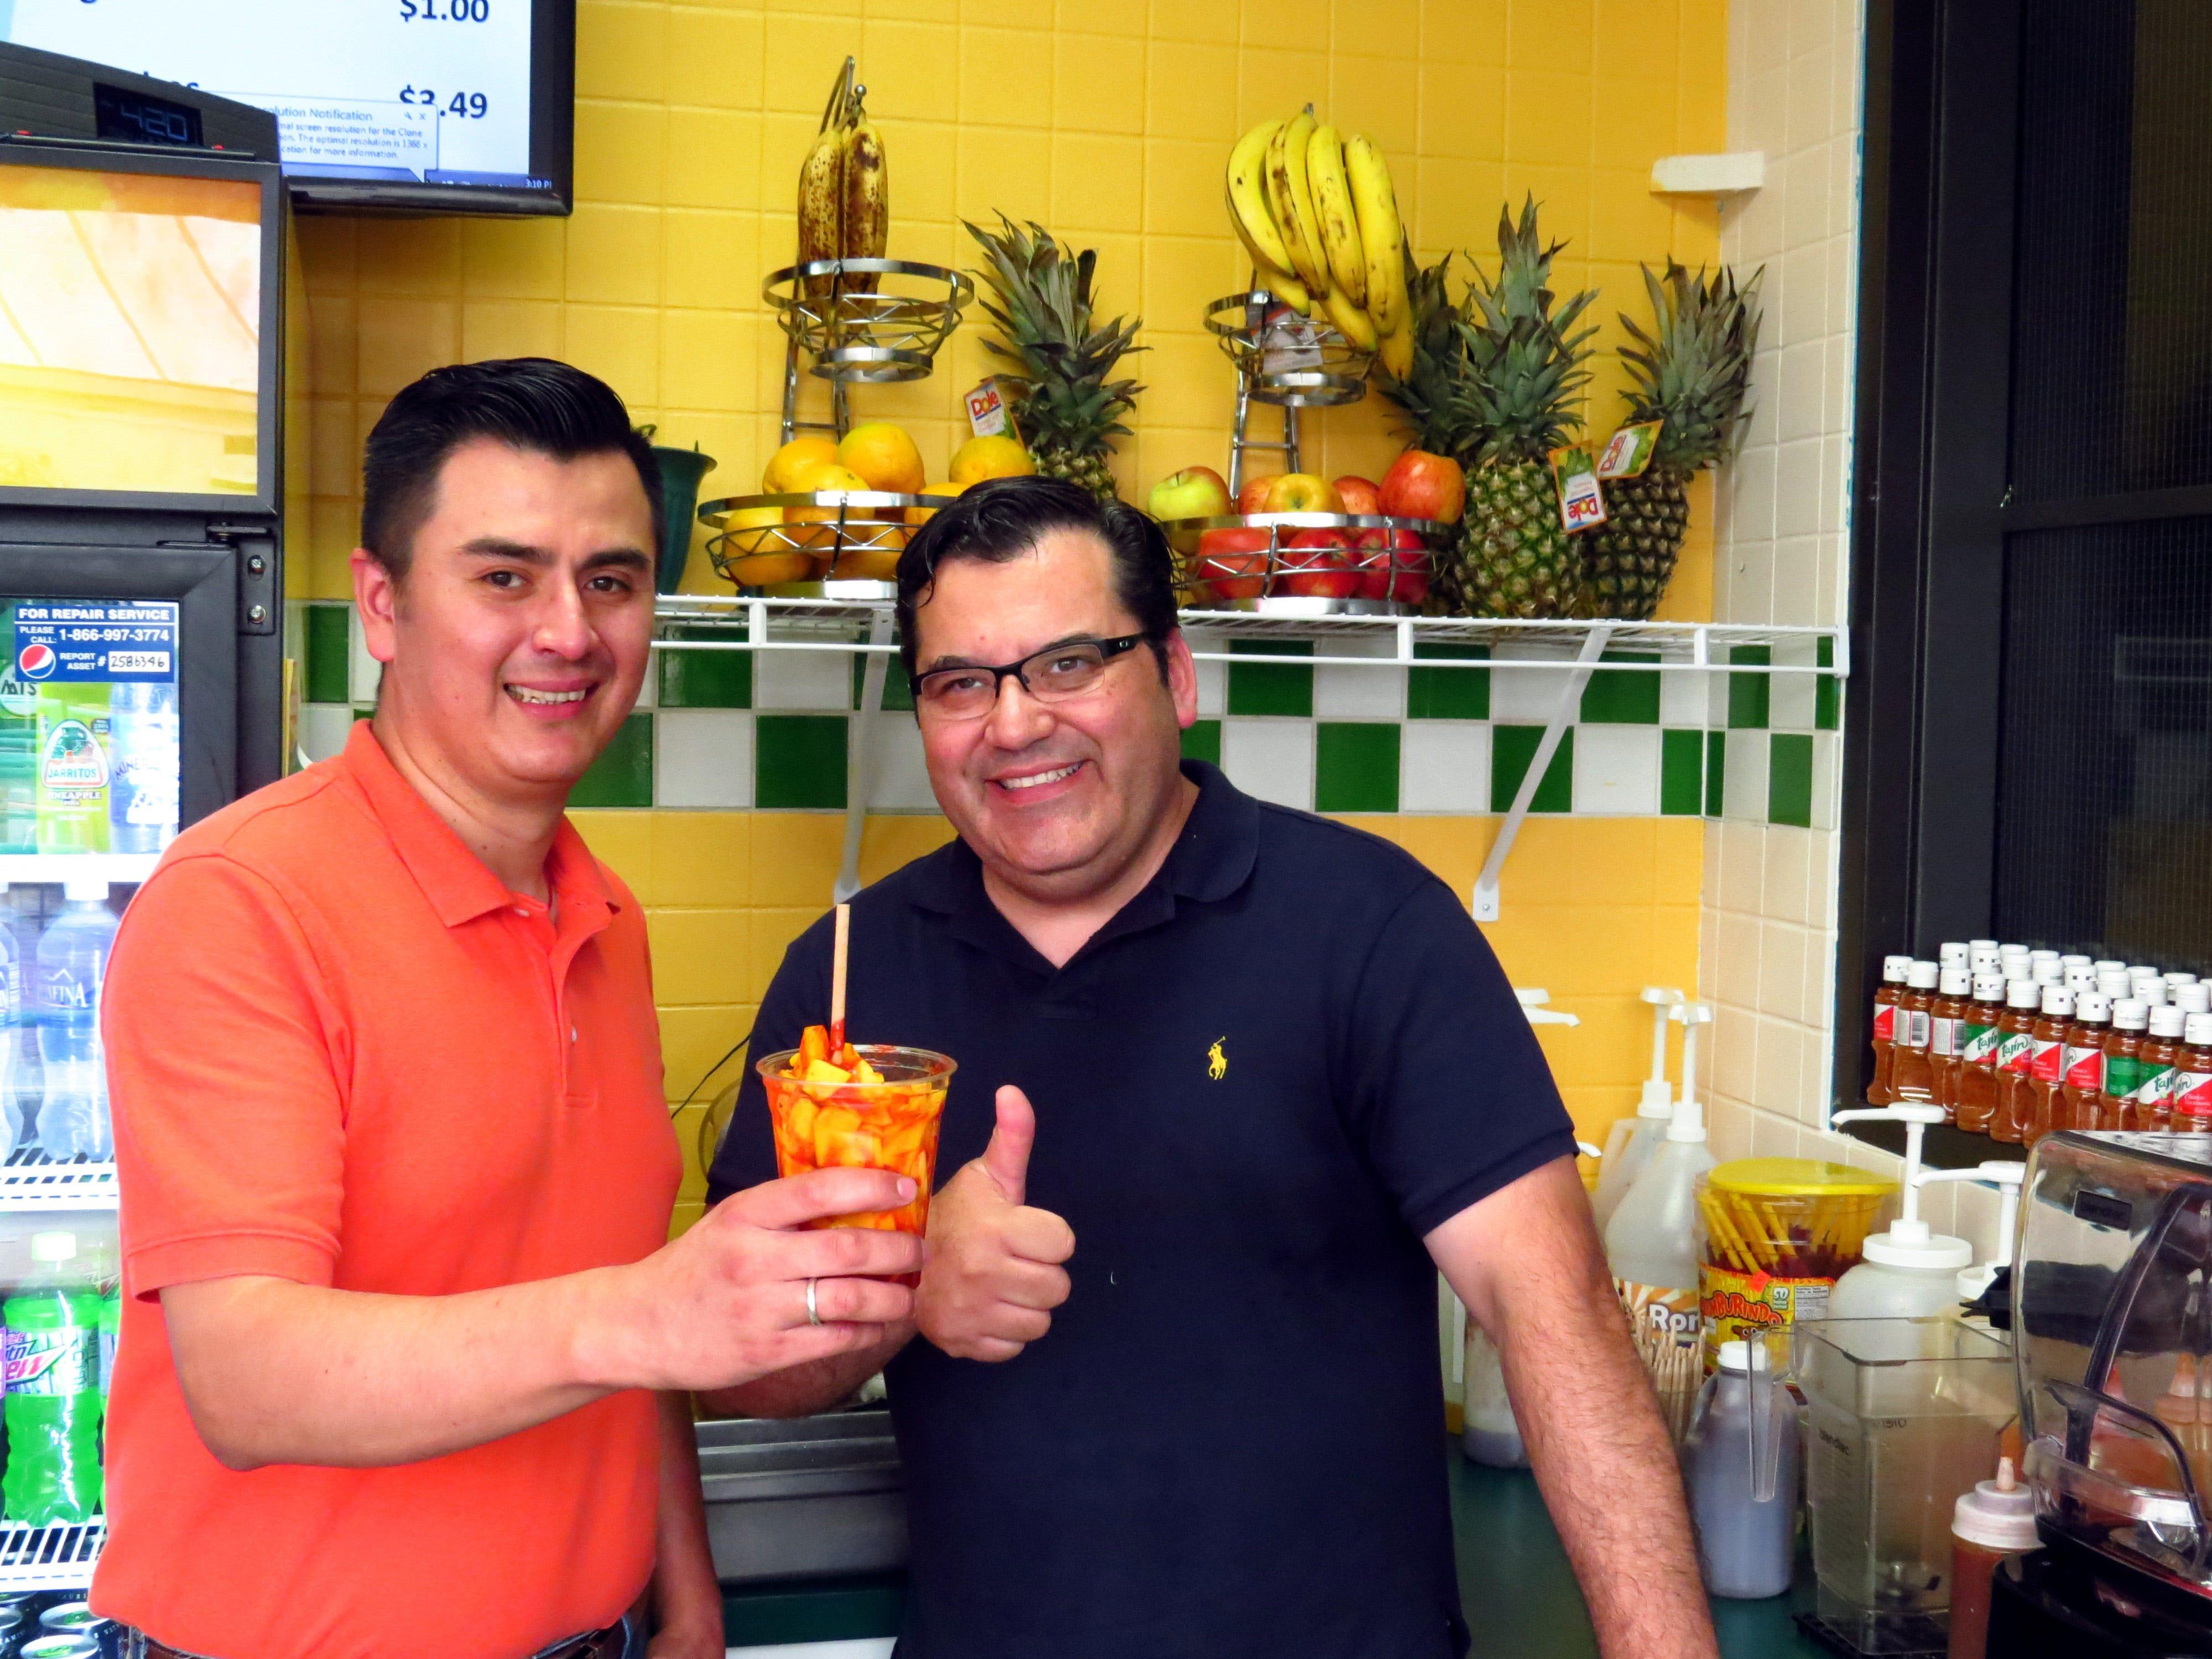 Ezequiel Campos, left, and Abraham Brown at the original La Campirana location in Washington Square Mall.